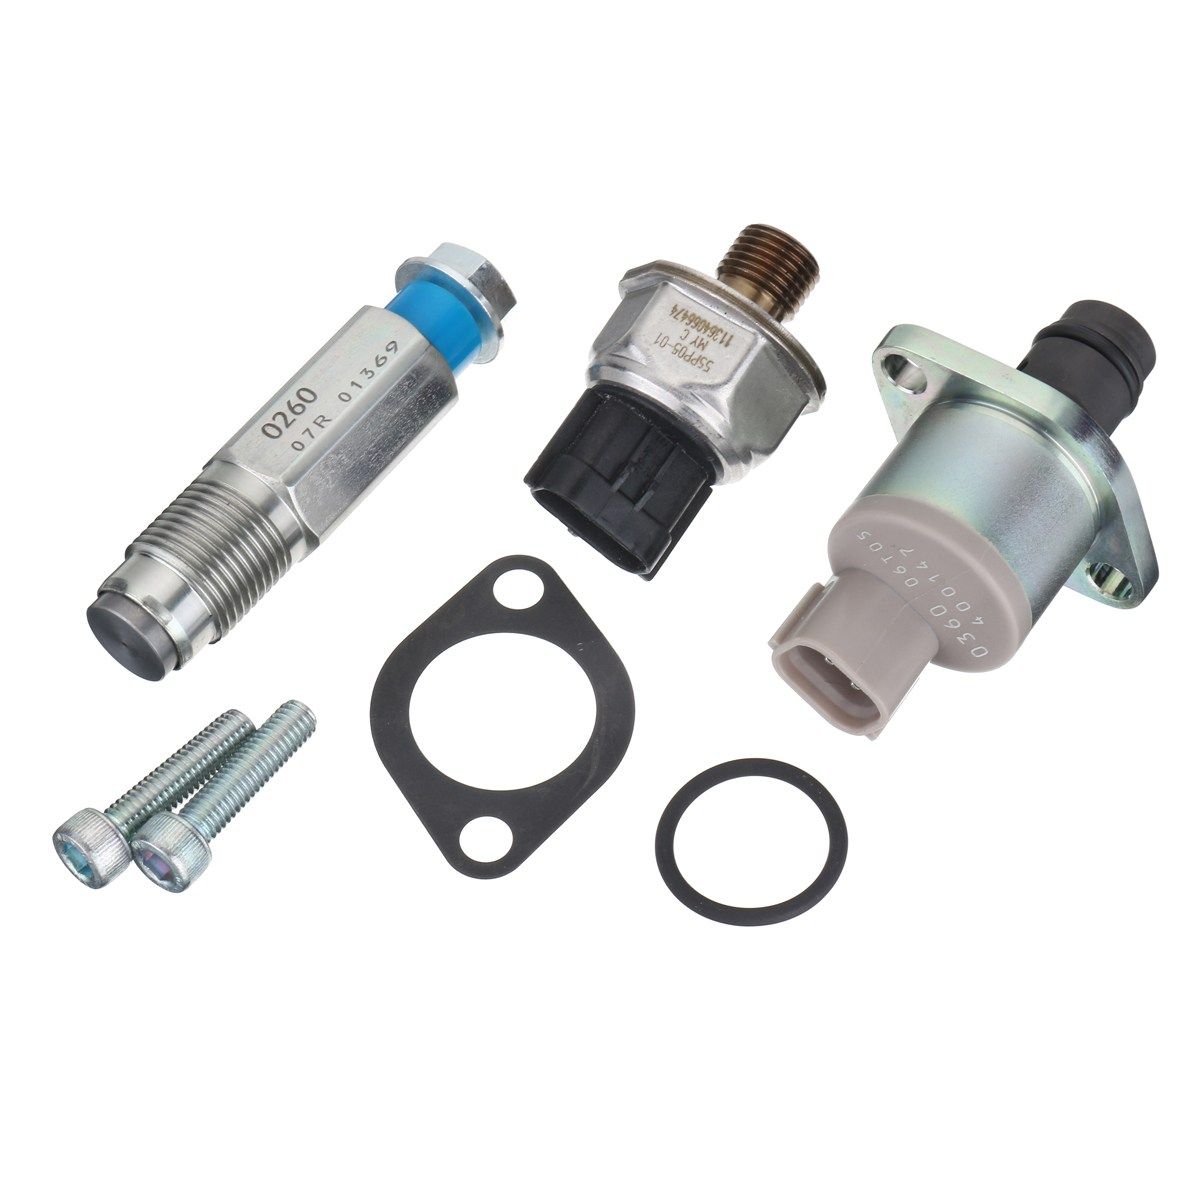 2.2 2.4 Fuel Pump Valve and Rail High Pressure Sensor For Ford/Fiat/Citroen/Peugeot/Diesel/Land Rover Tourneo DefenderTransit стоимость